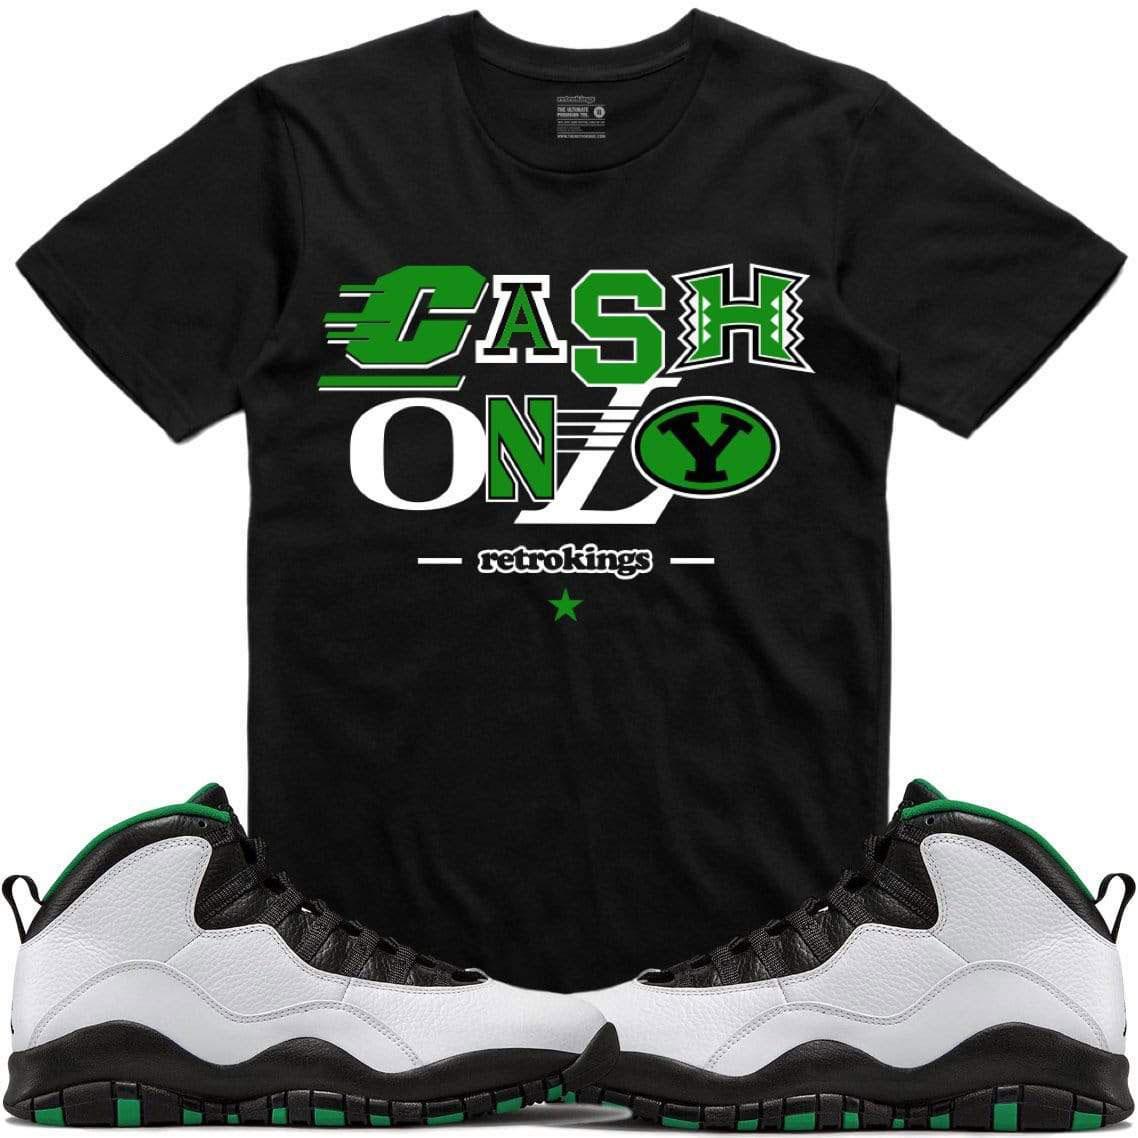 jordan-10-seattle-sneaker-shirts-retro-kings-8